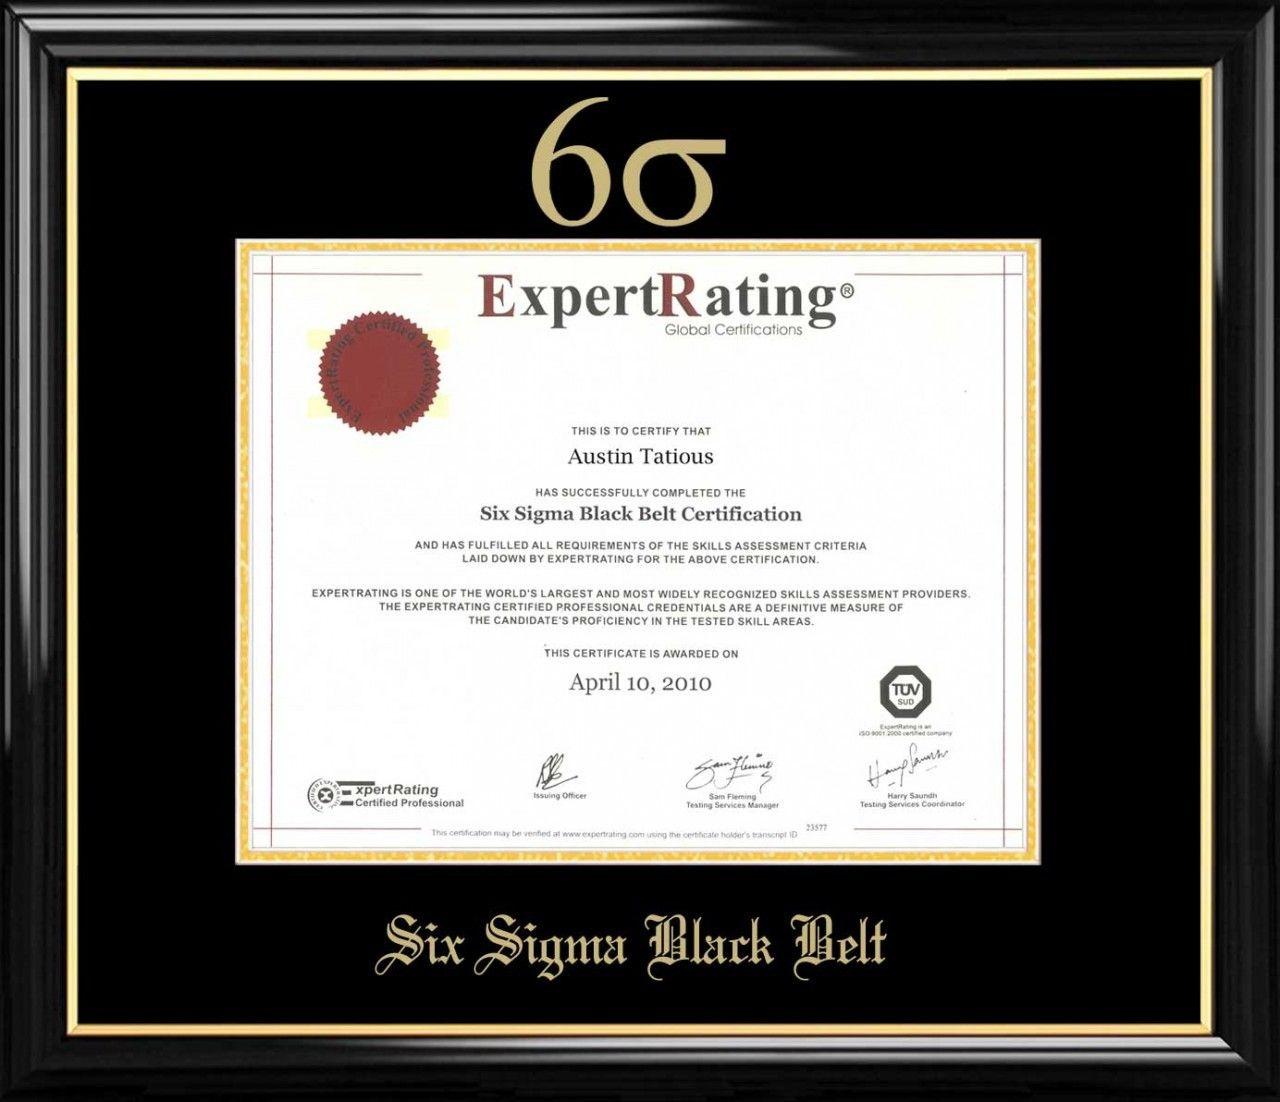 Six sigma black belt certificate frame black with black mat certificate size 85h x 11w this frame and mat are designed xflitez Gallery